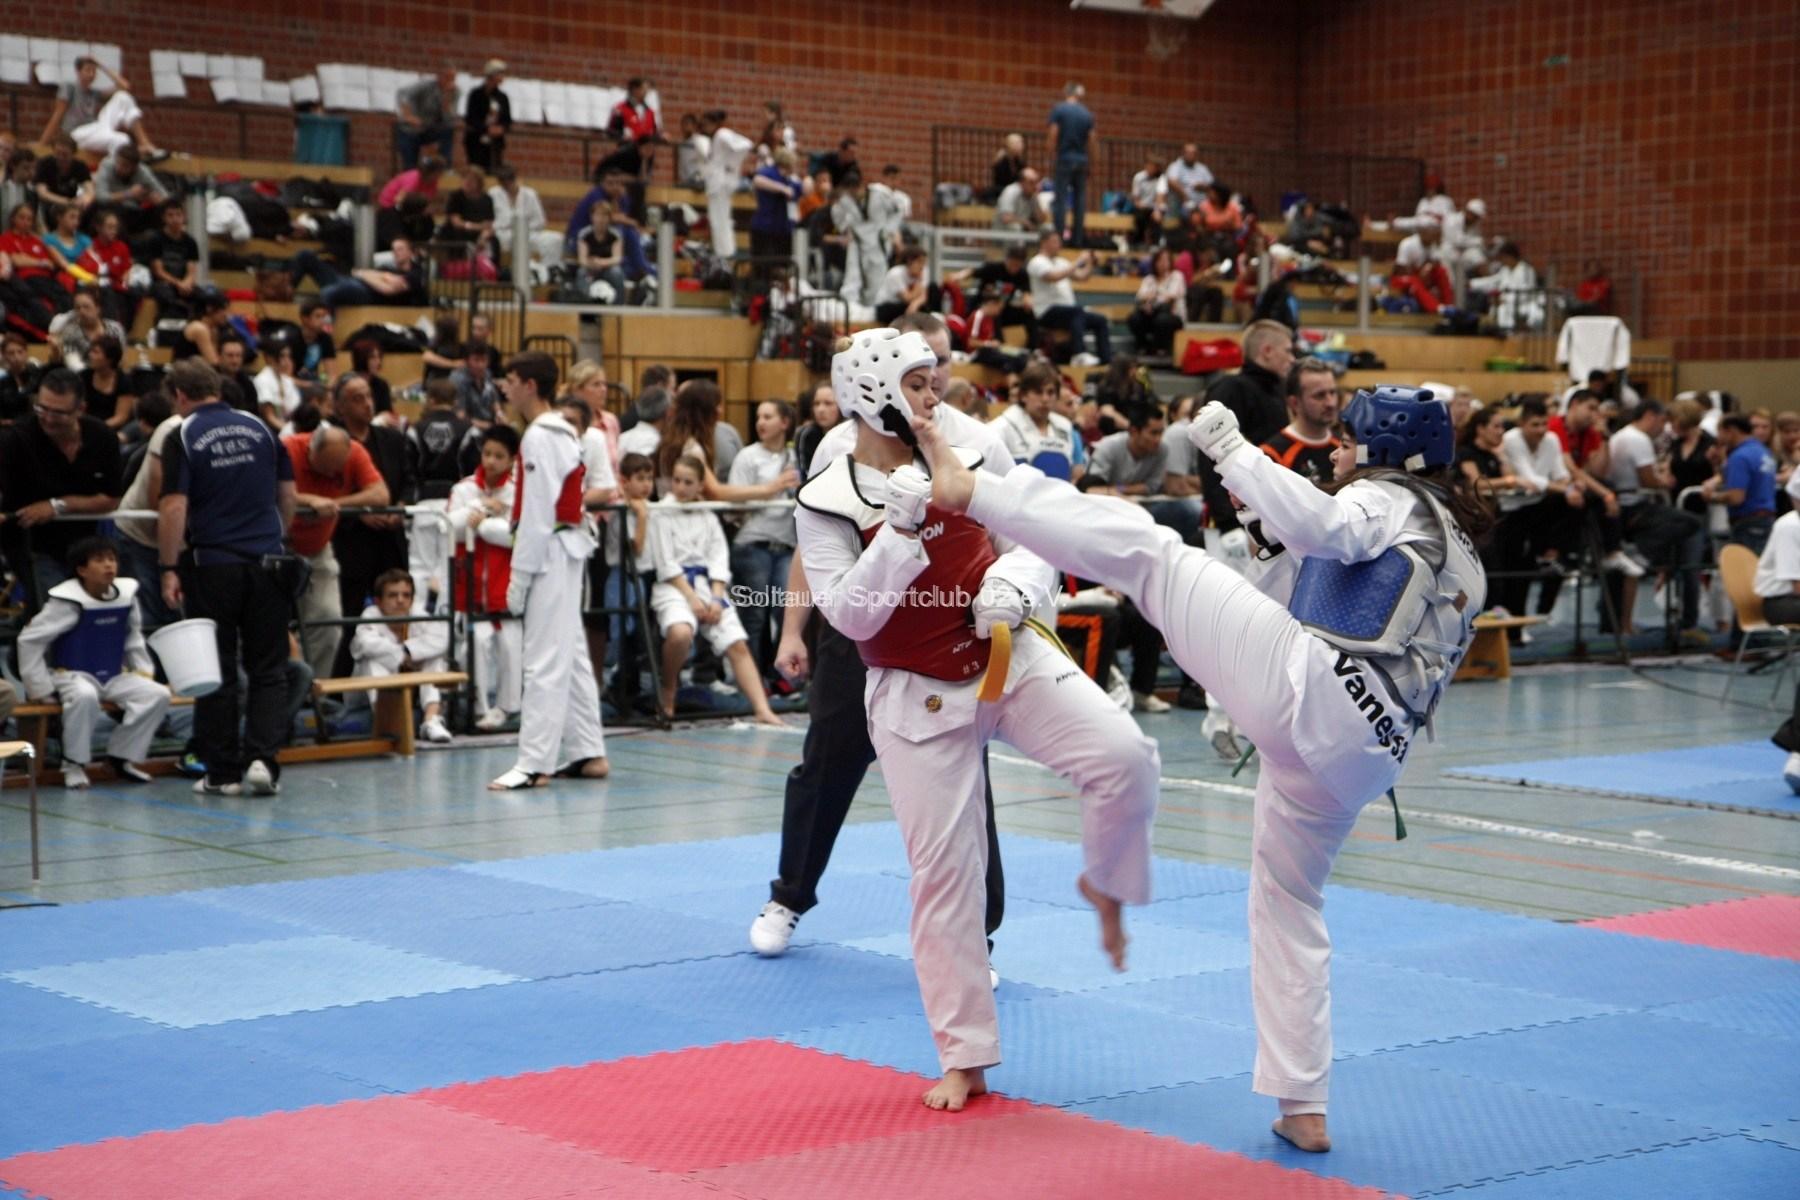 2011-06-25-bavaria-open-0214